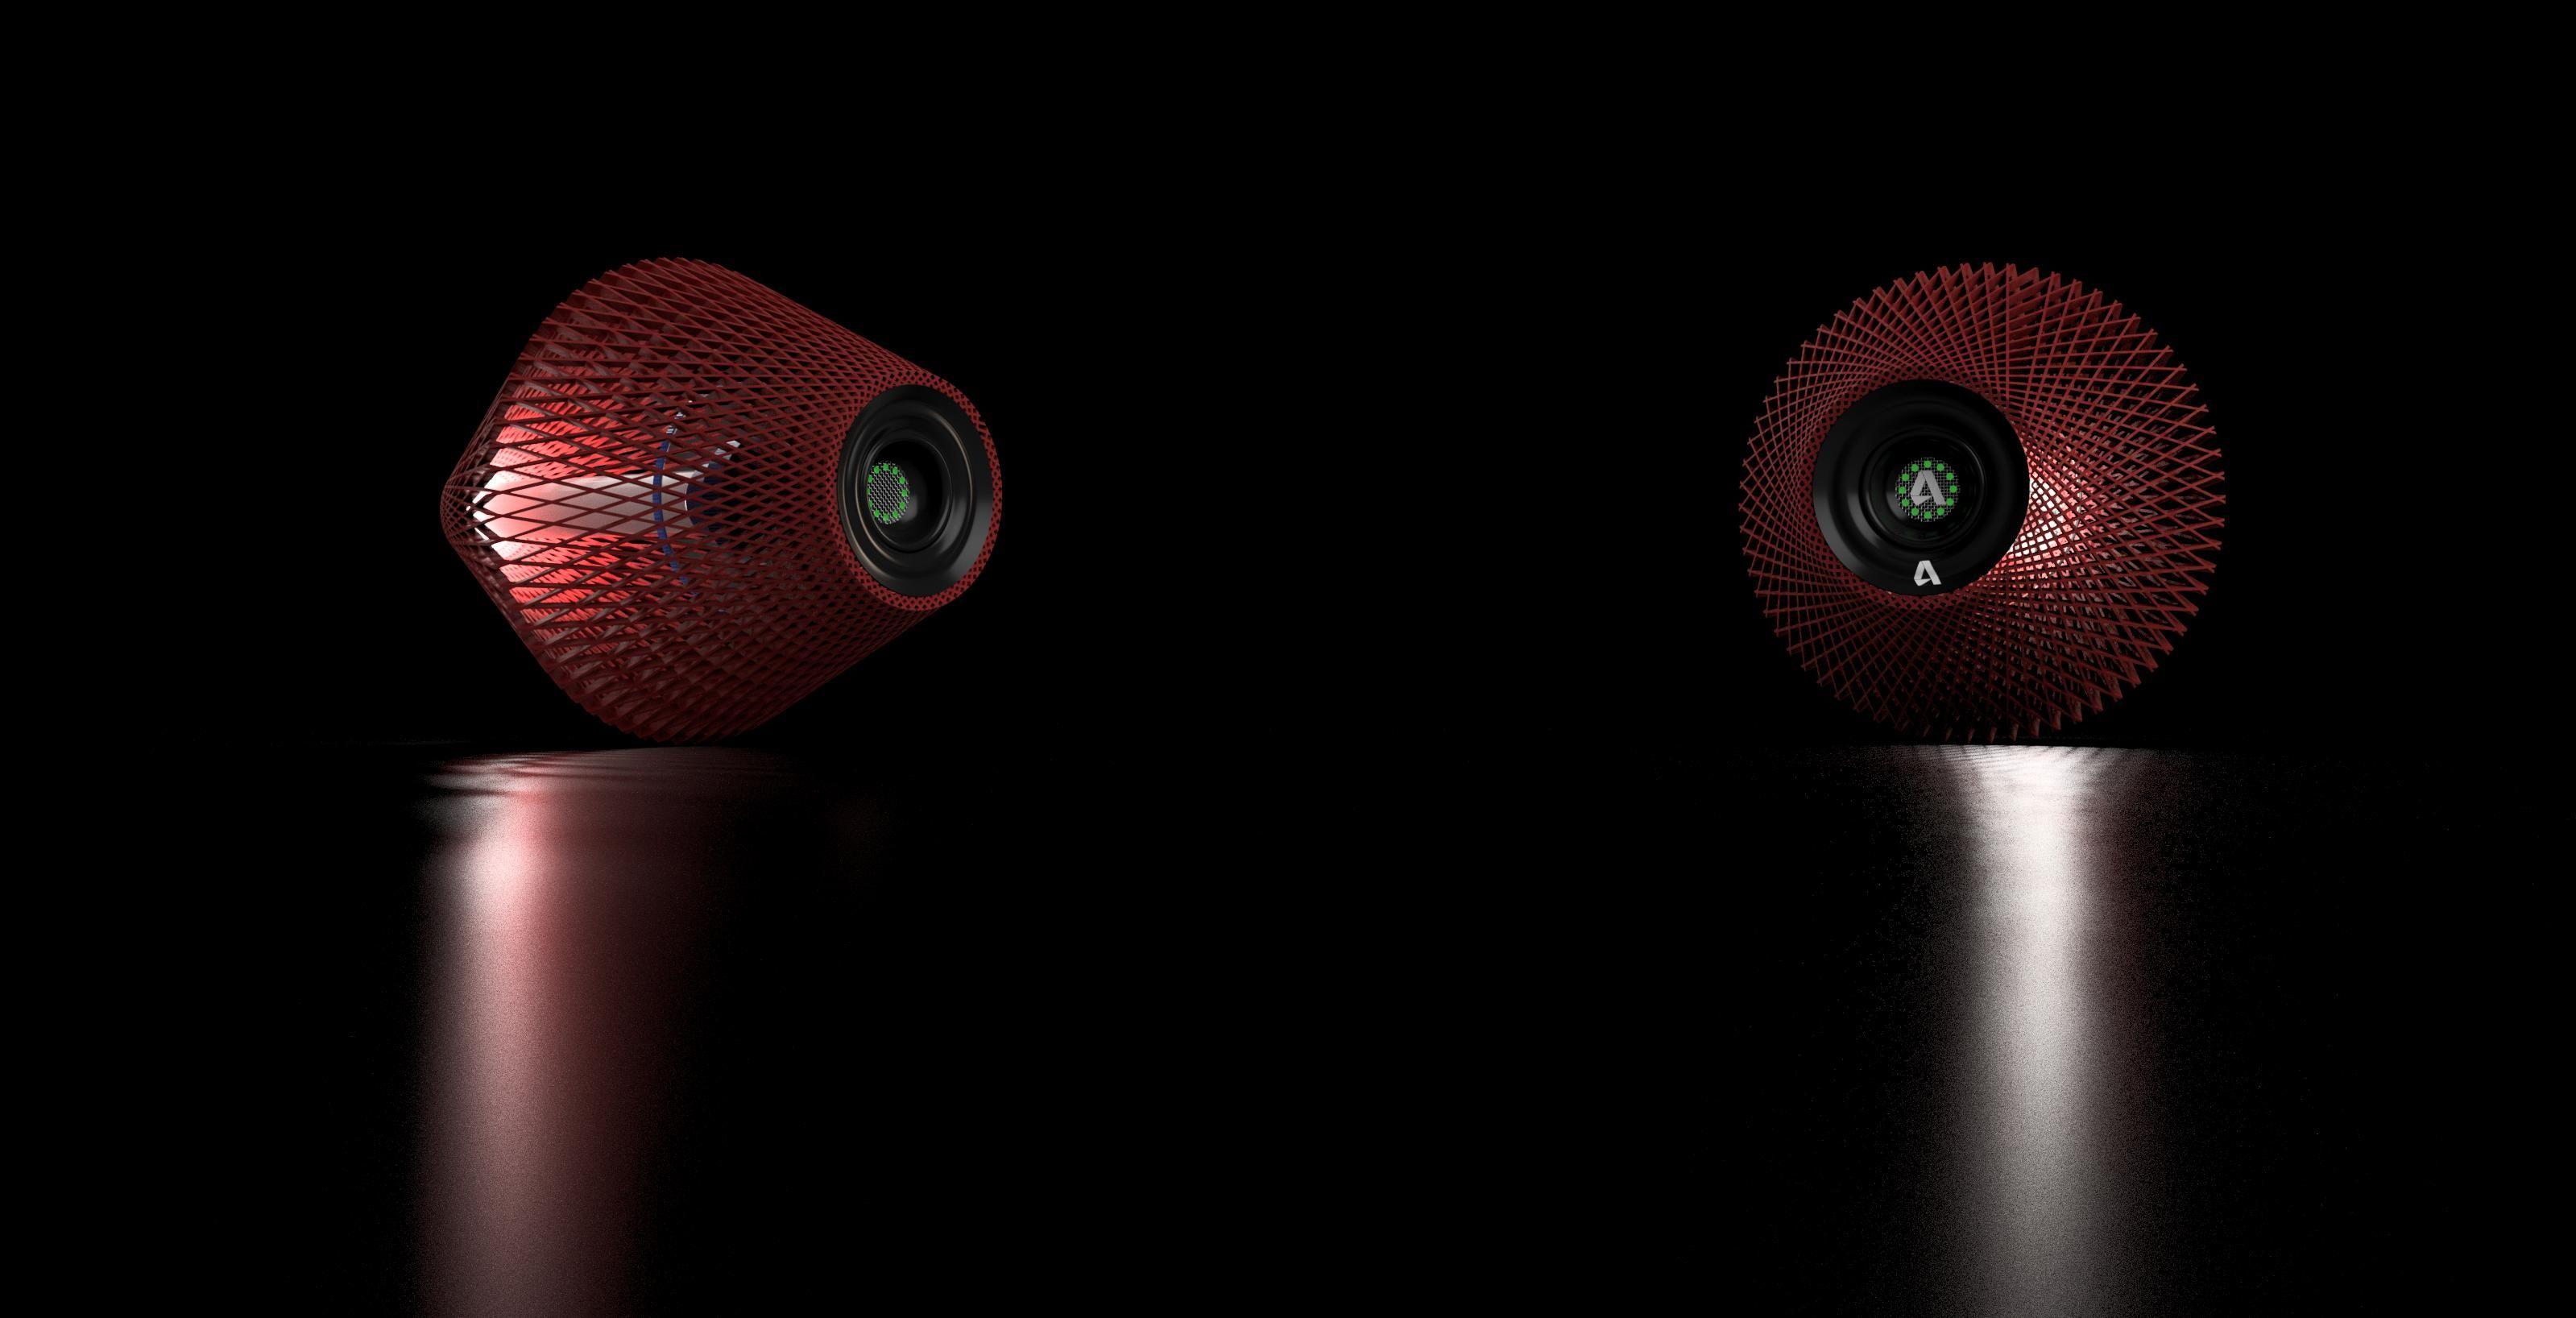 Earbud-completlynewone-02-v2899-3500-3500